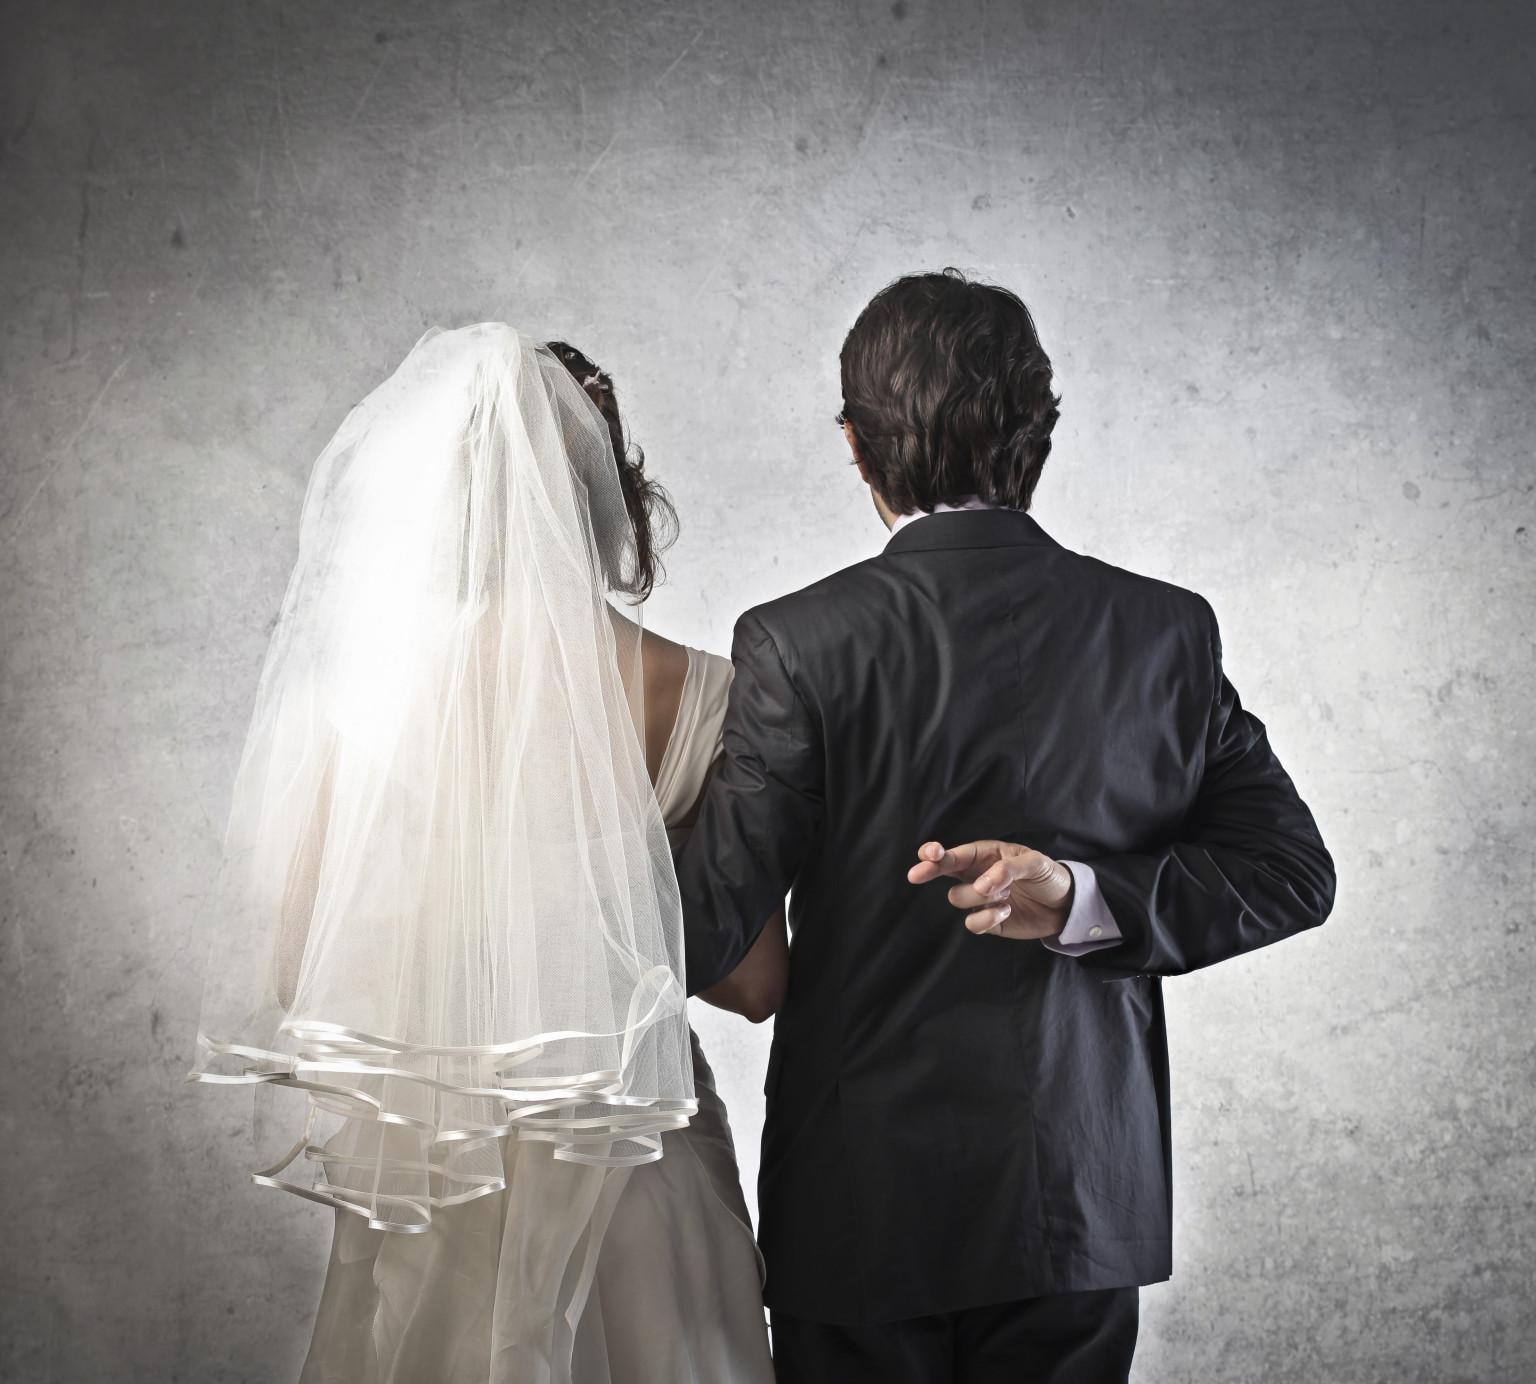 Приколы про свадьбы картинки, картинки